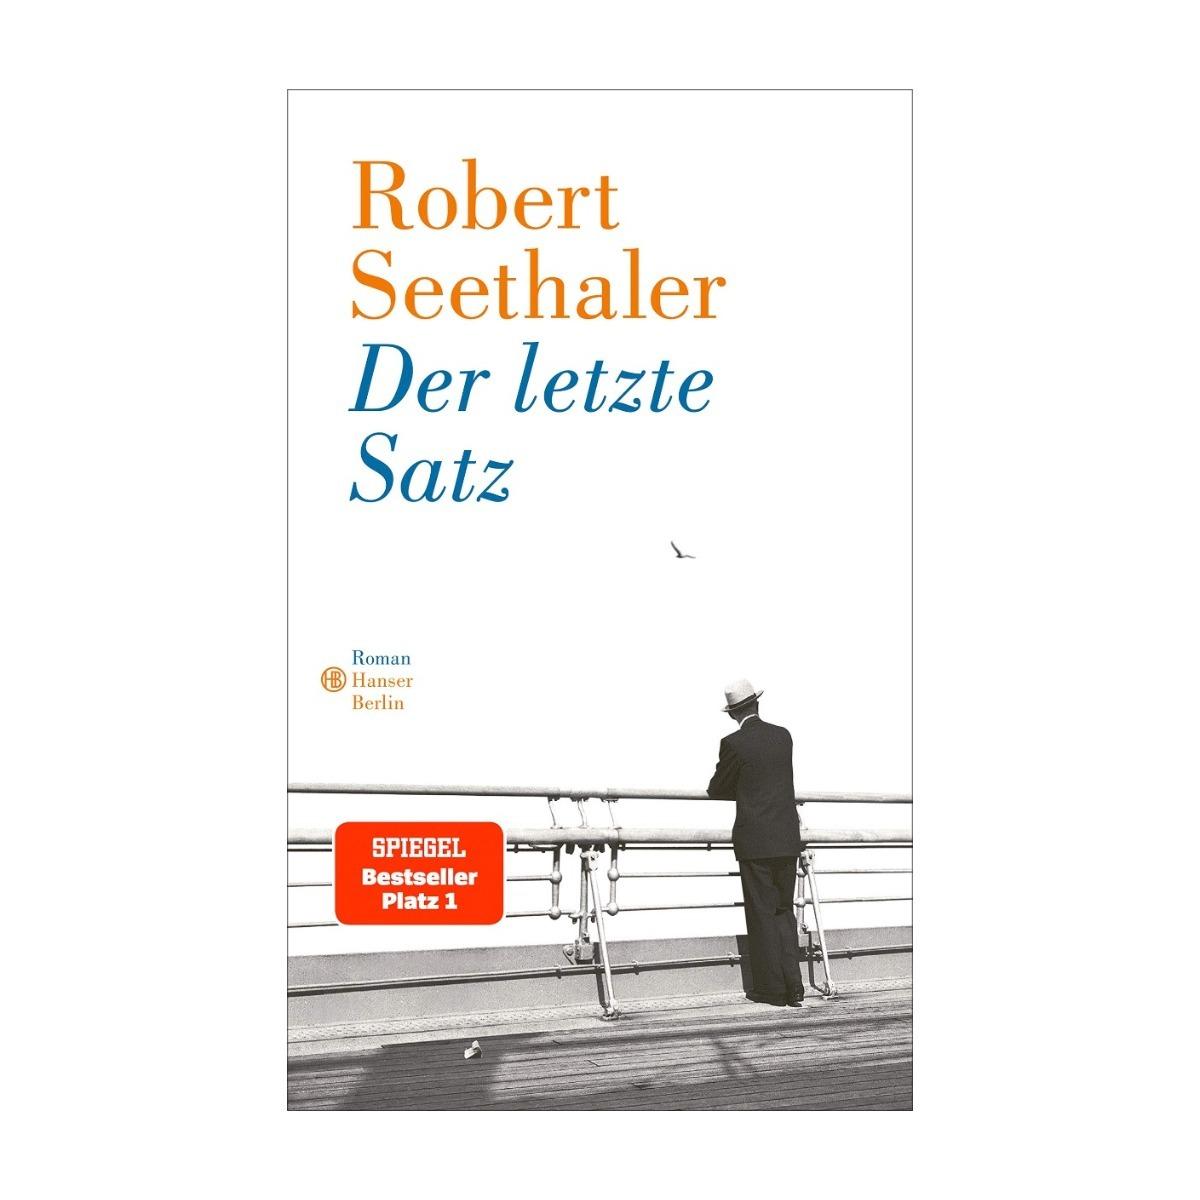 Robert Seetaler - Der letzte Satz